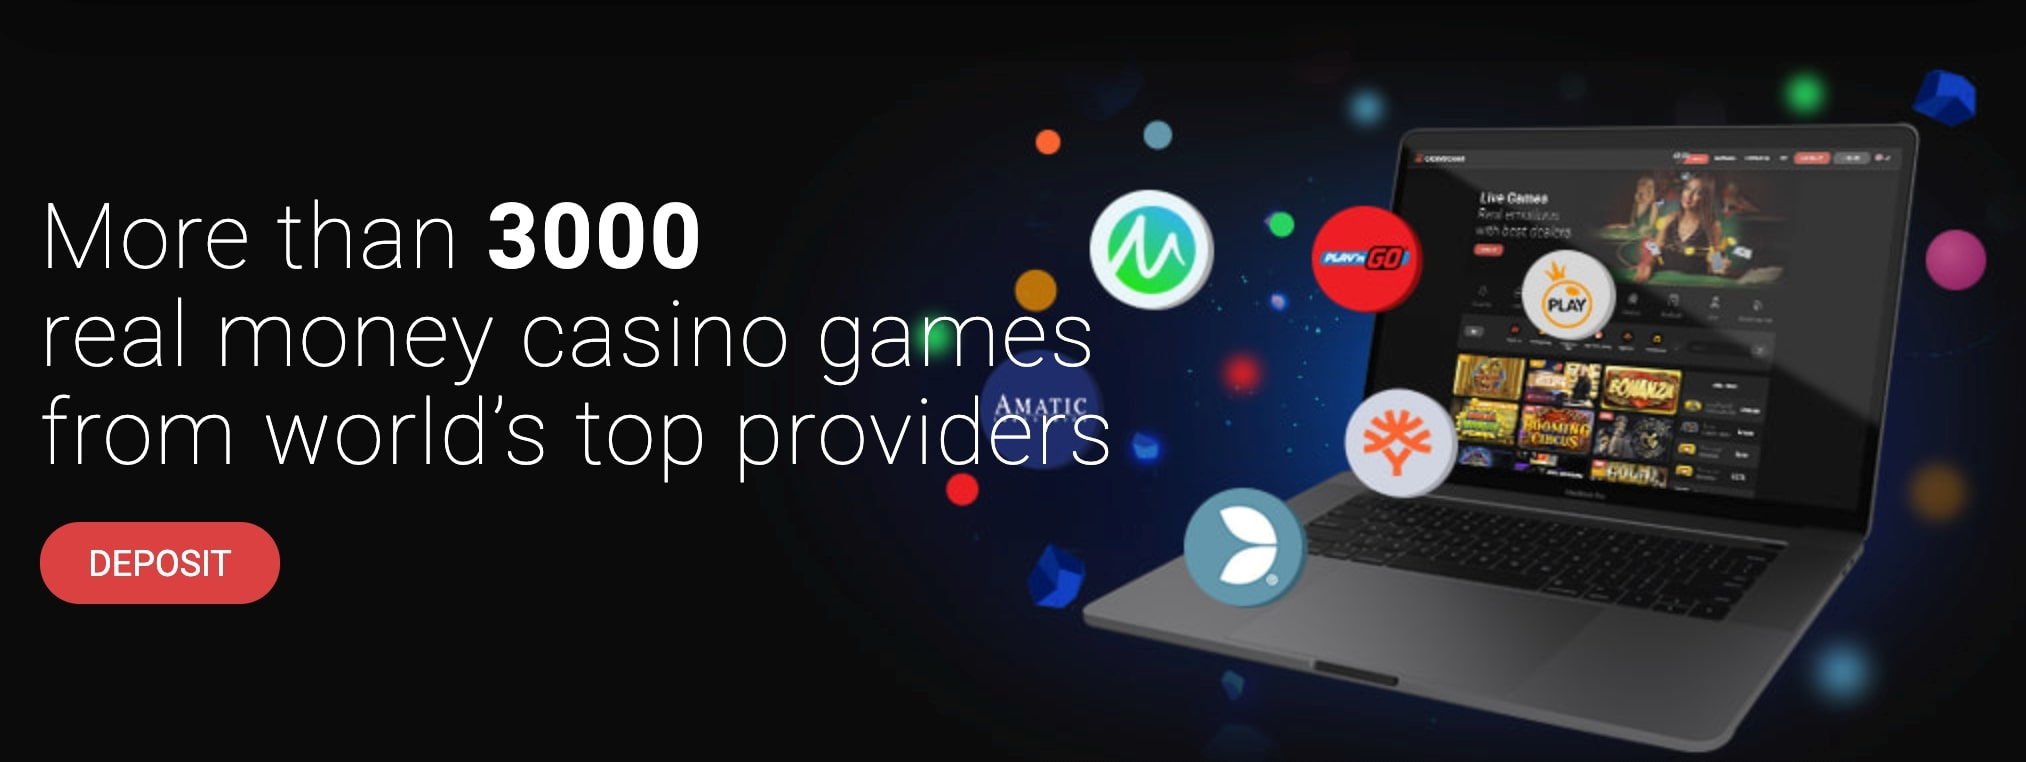 CasinoChan Bonus & Casino Review